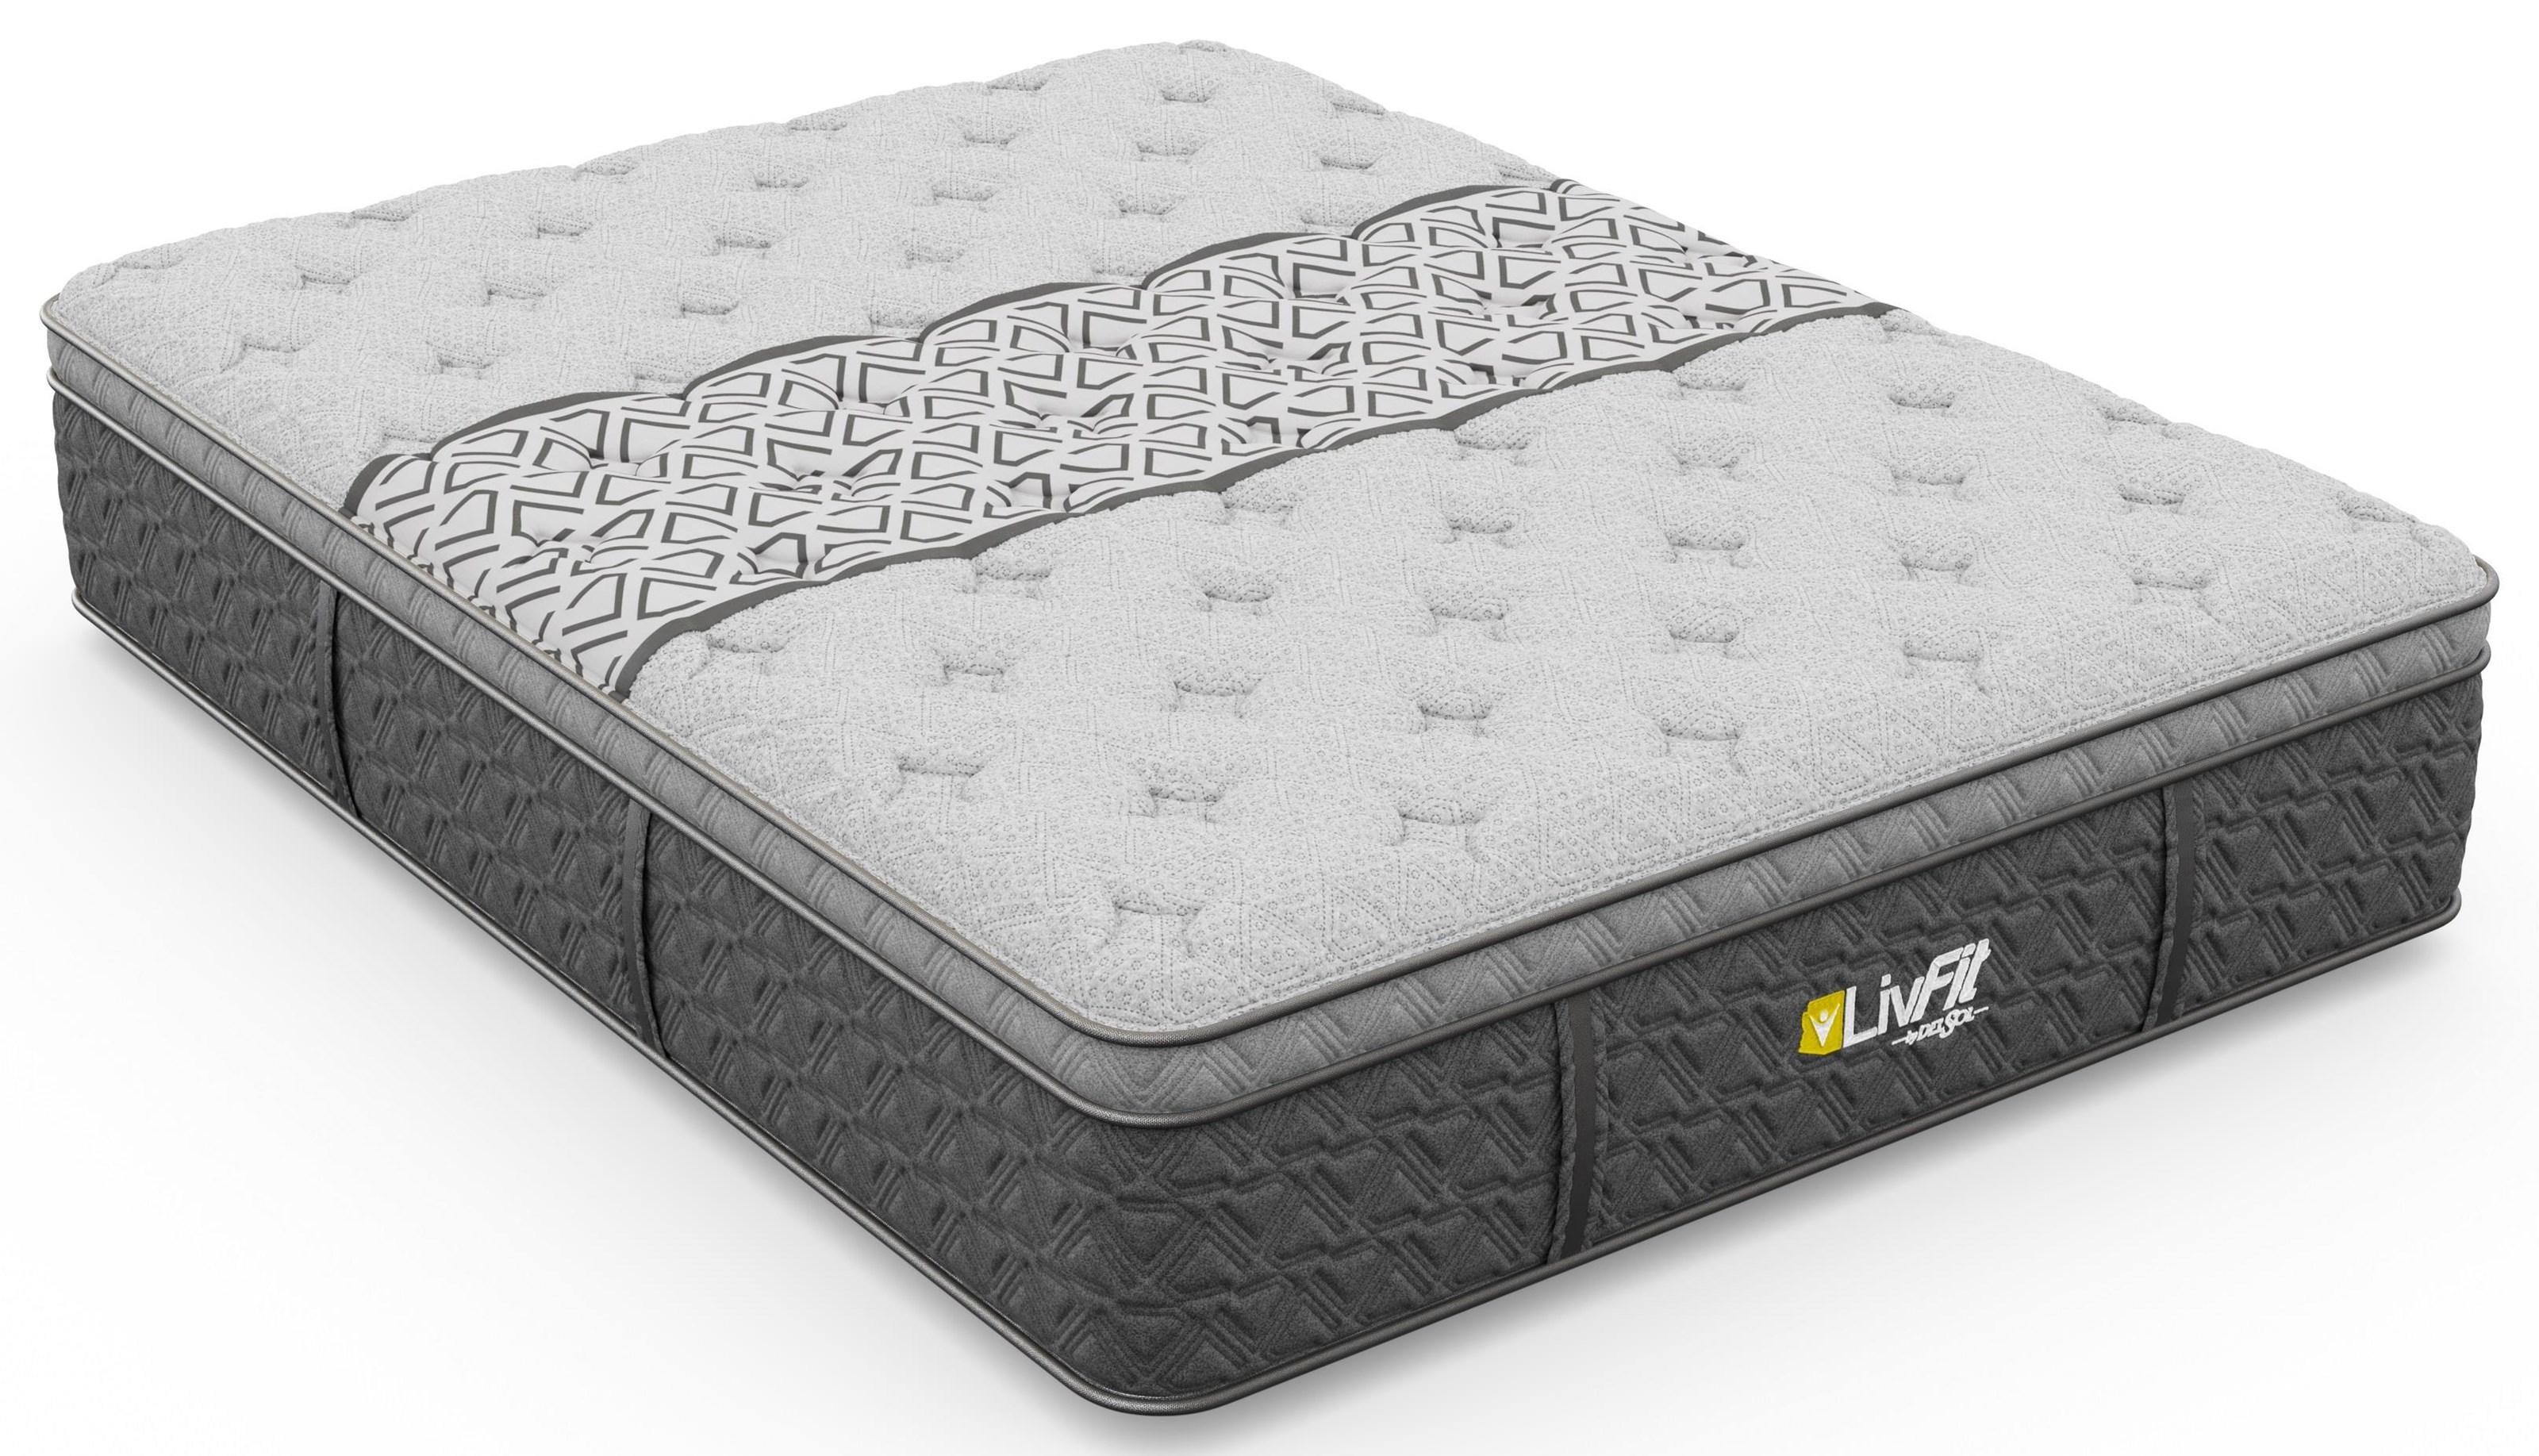 "LivFit Plush Euro Top Twin XL 14"" Plush Euro Top Mattress by Sleep Shop Mattress at Del Sol Furniture"